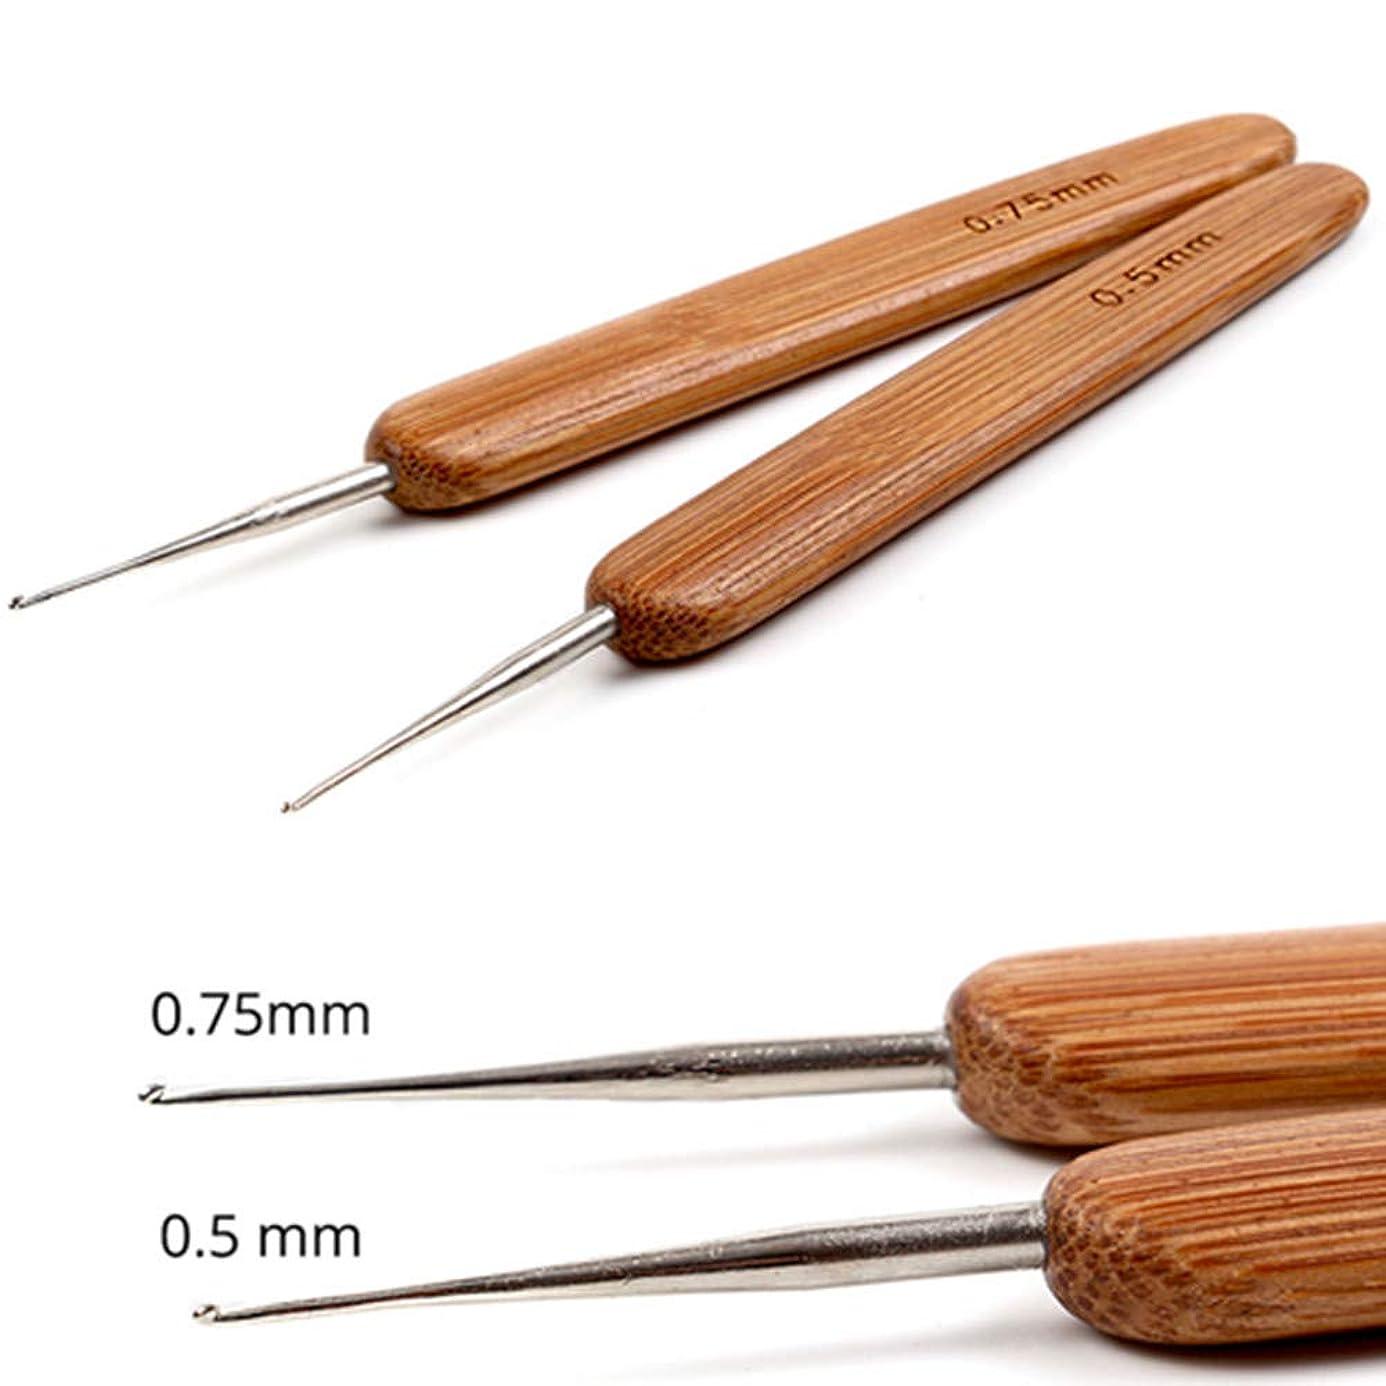 MGQFY Dreadlock Crochet Hook Steel 0.5mm 0.75mm Crochet Hook for Dreads Hair Bamboo Dreadlock Needle Tool for Braid Craft. (0.5mm +0.75mm) kbw5054871